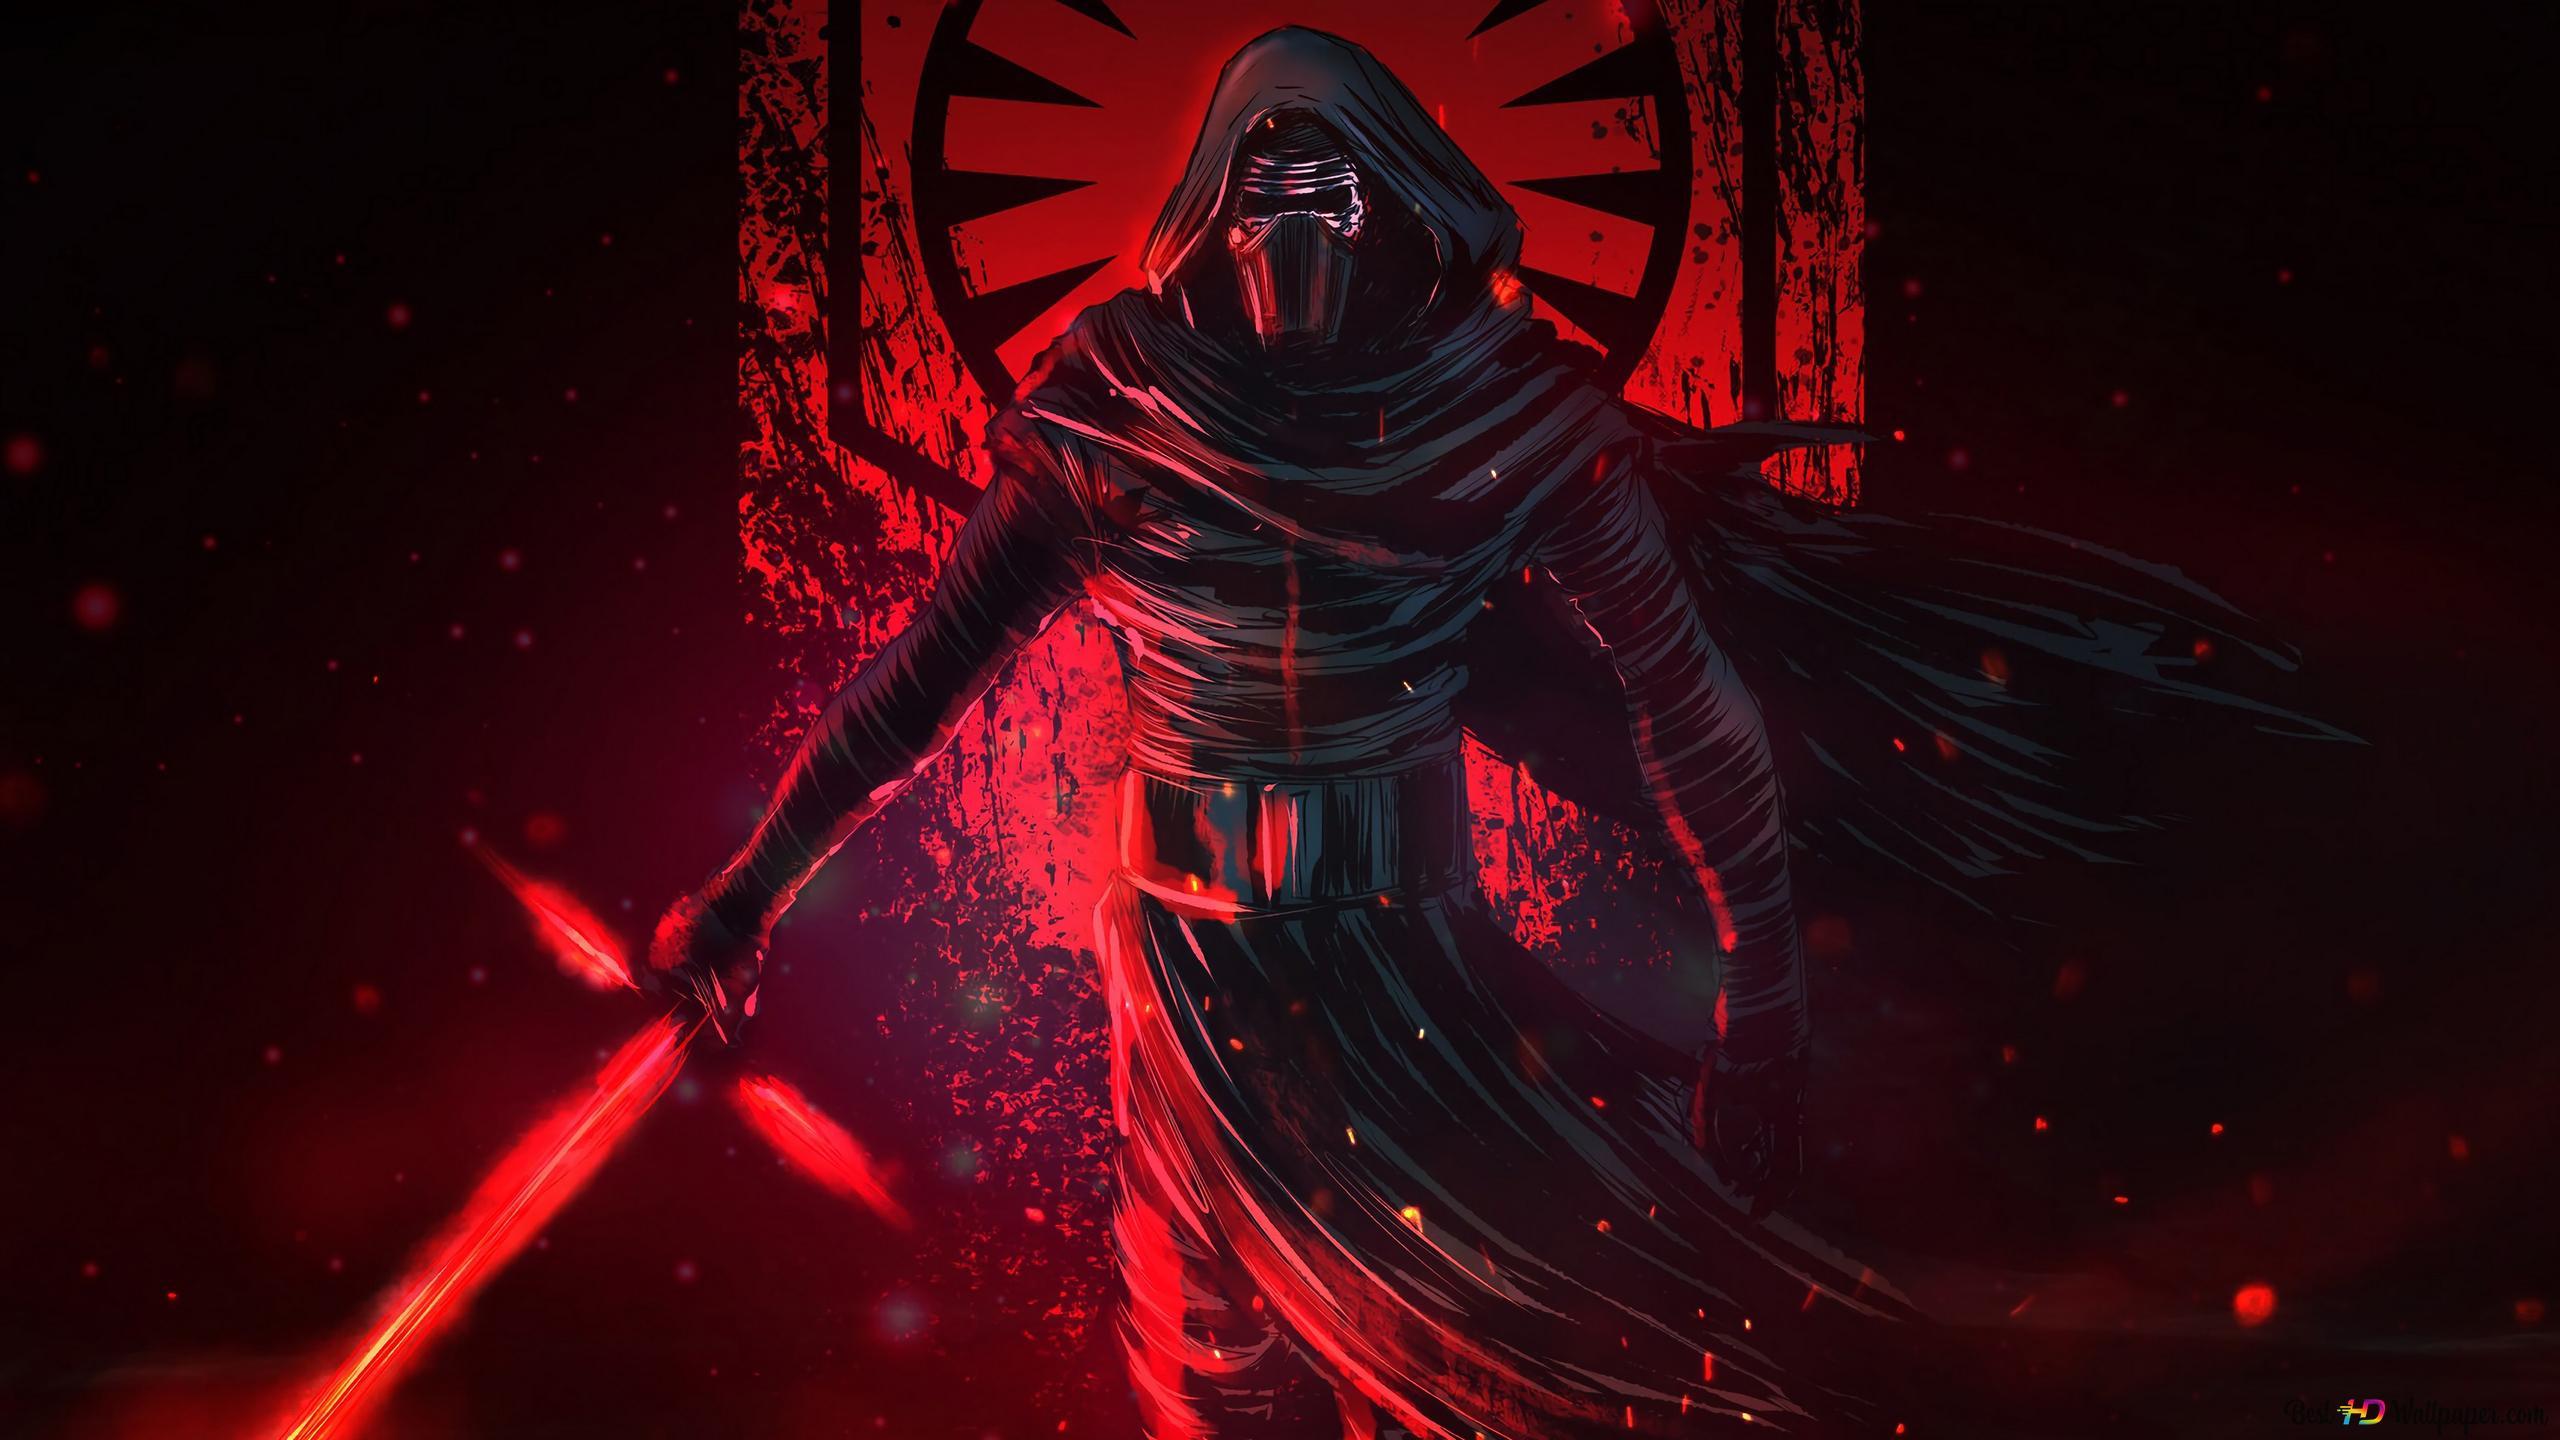 Star Wars 9 Kylo Ren Unduhan Wallpaper Hd